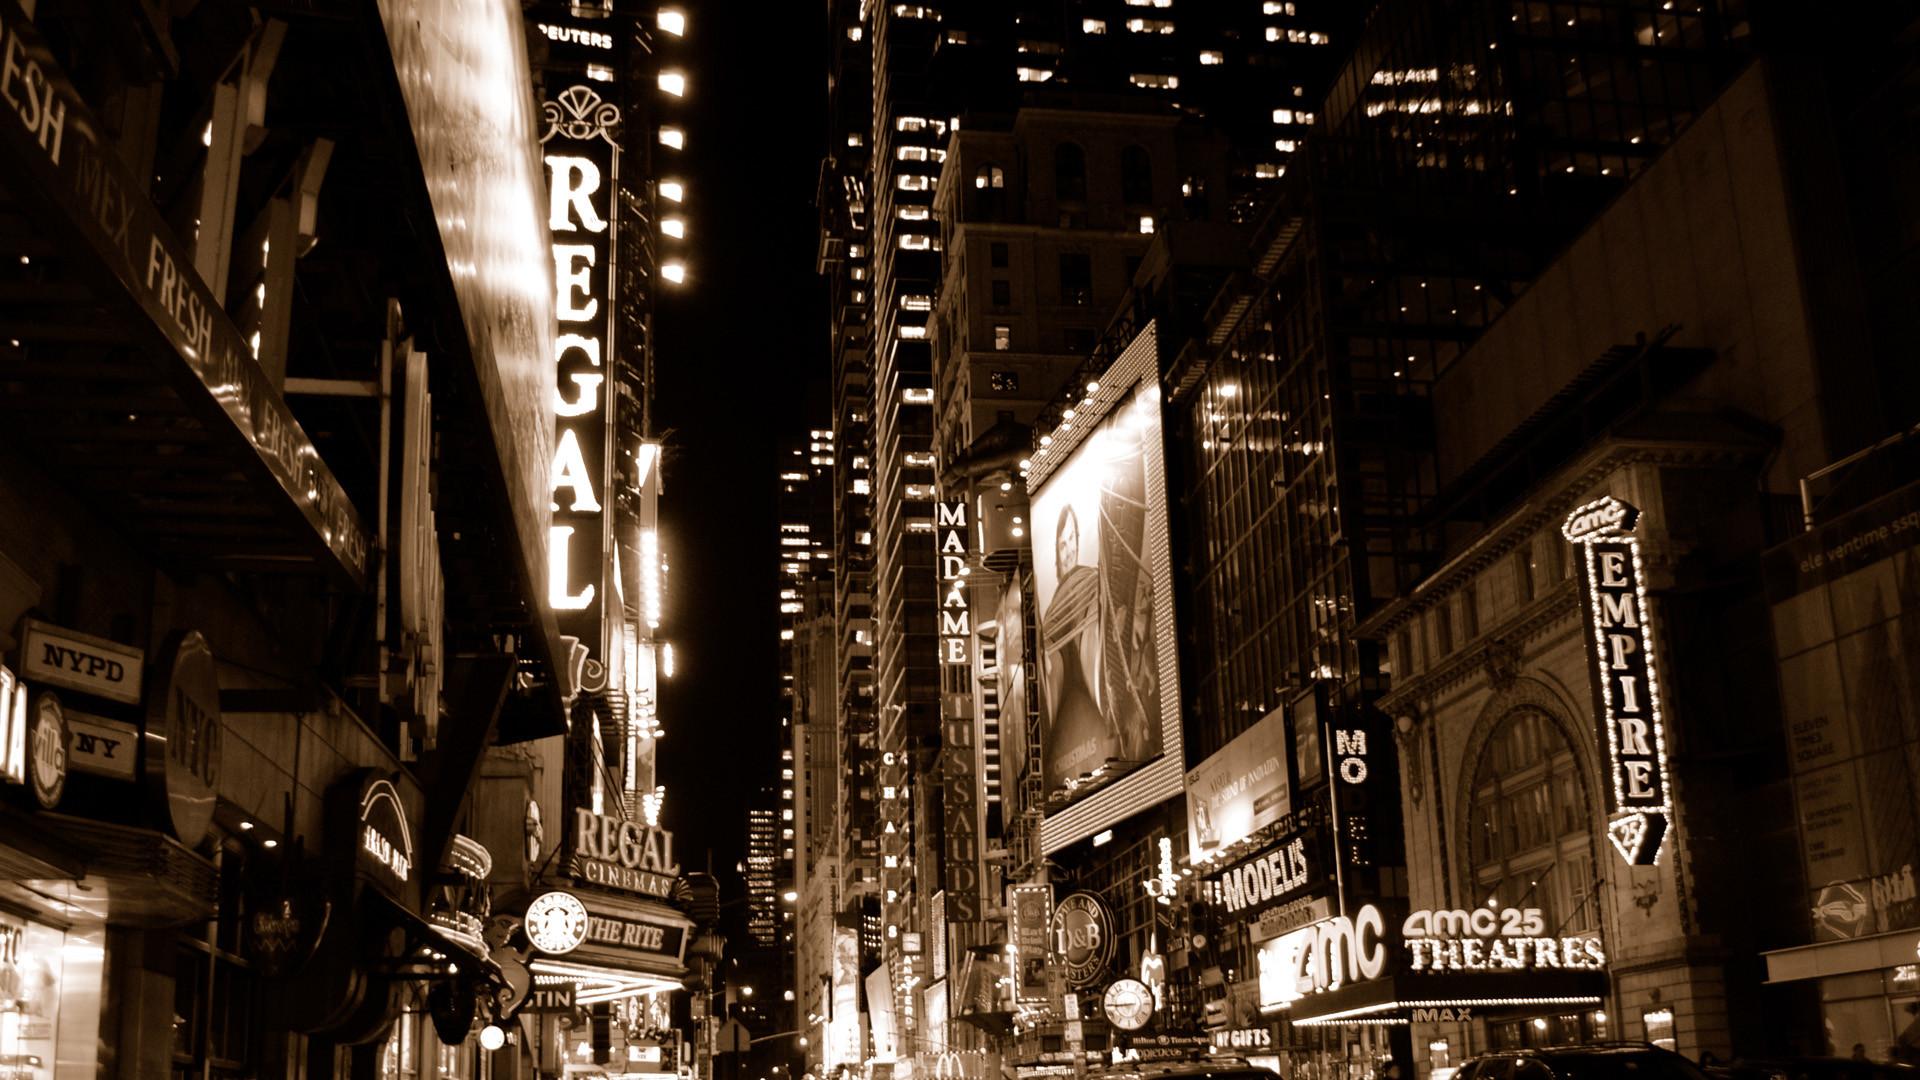 New York City Street HD wallpaper